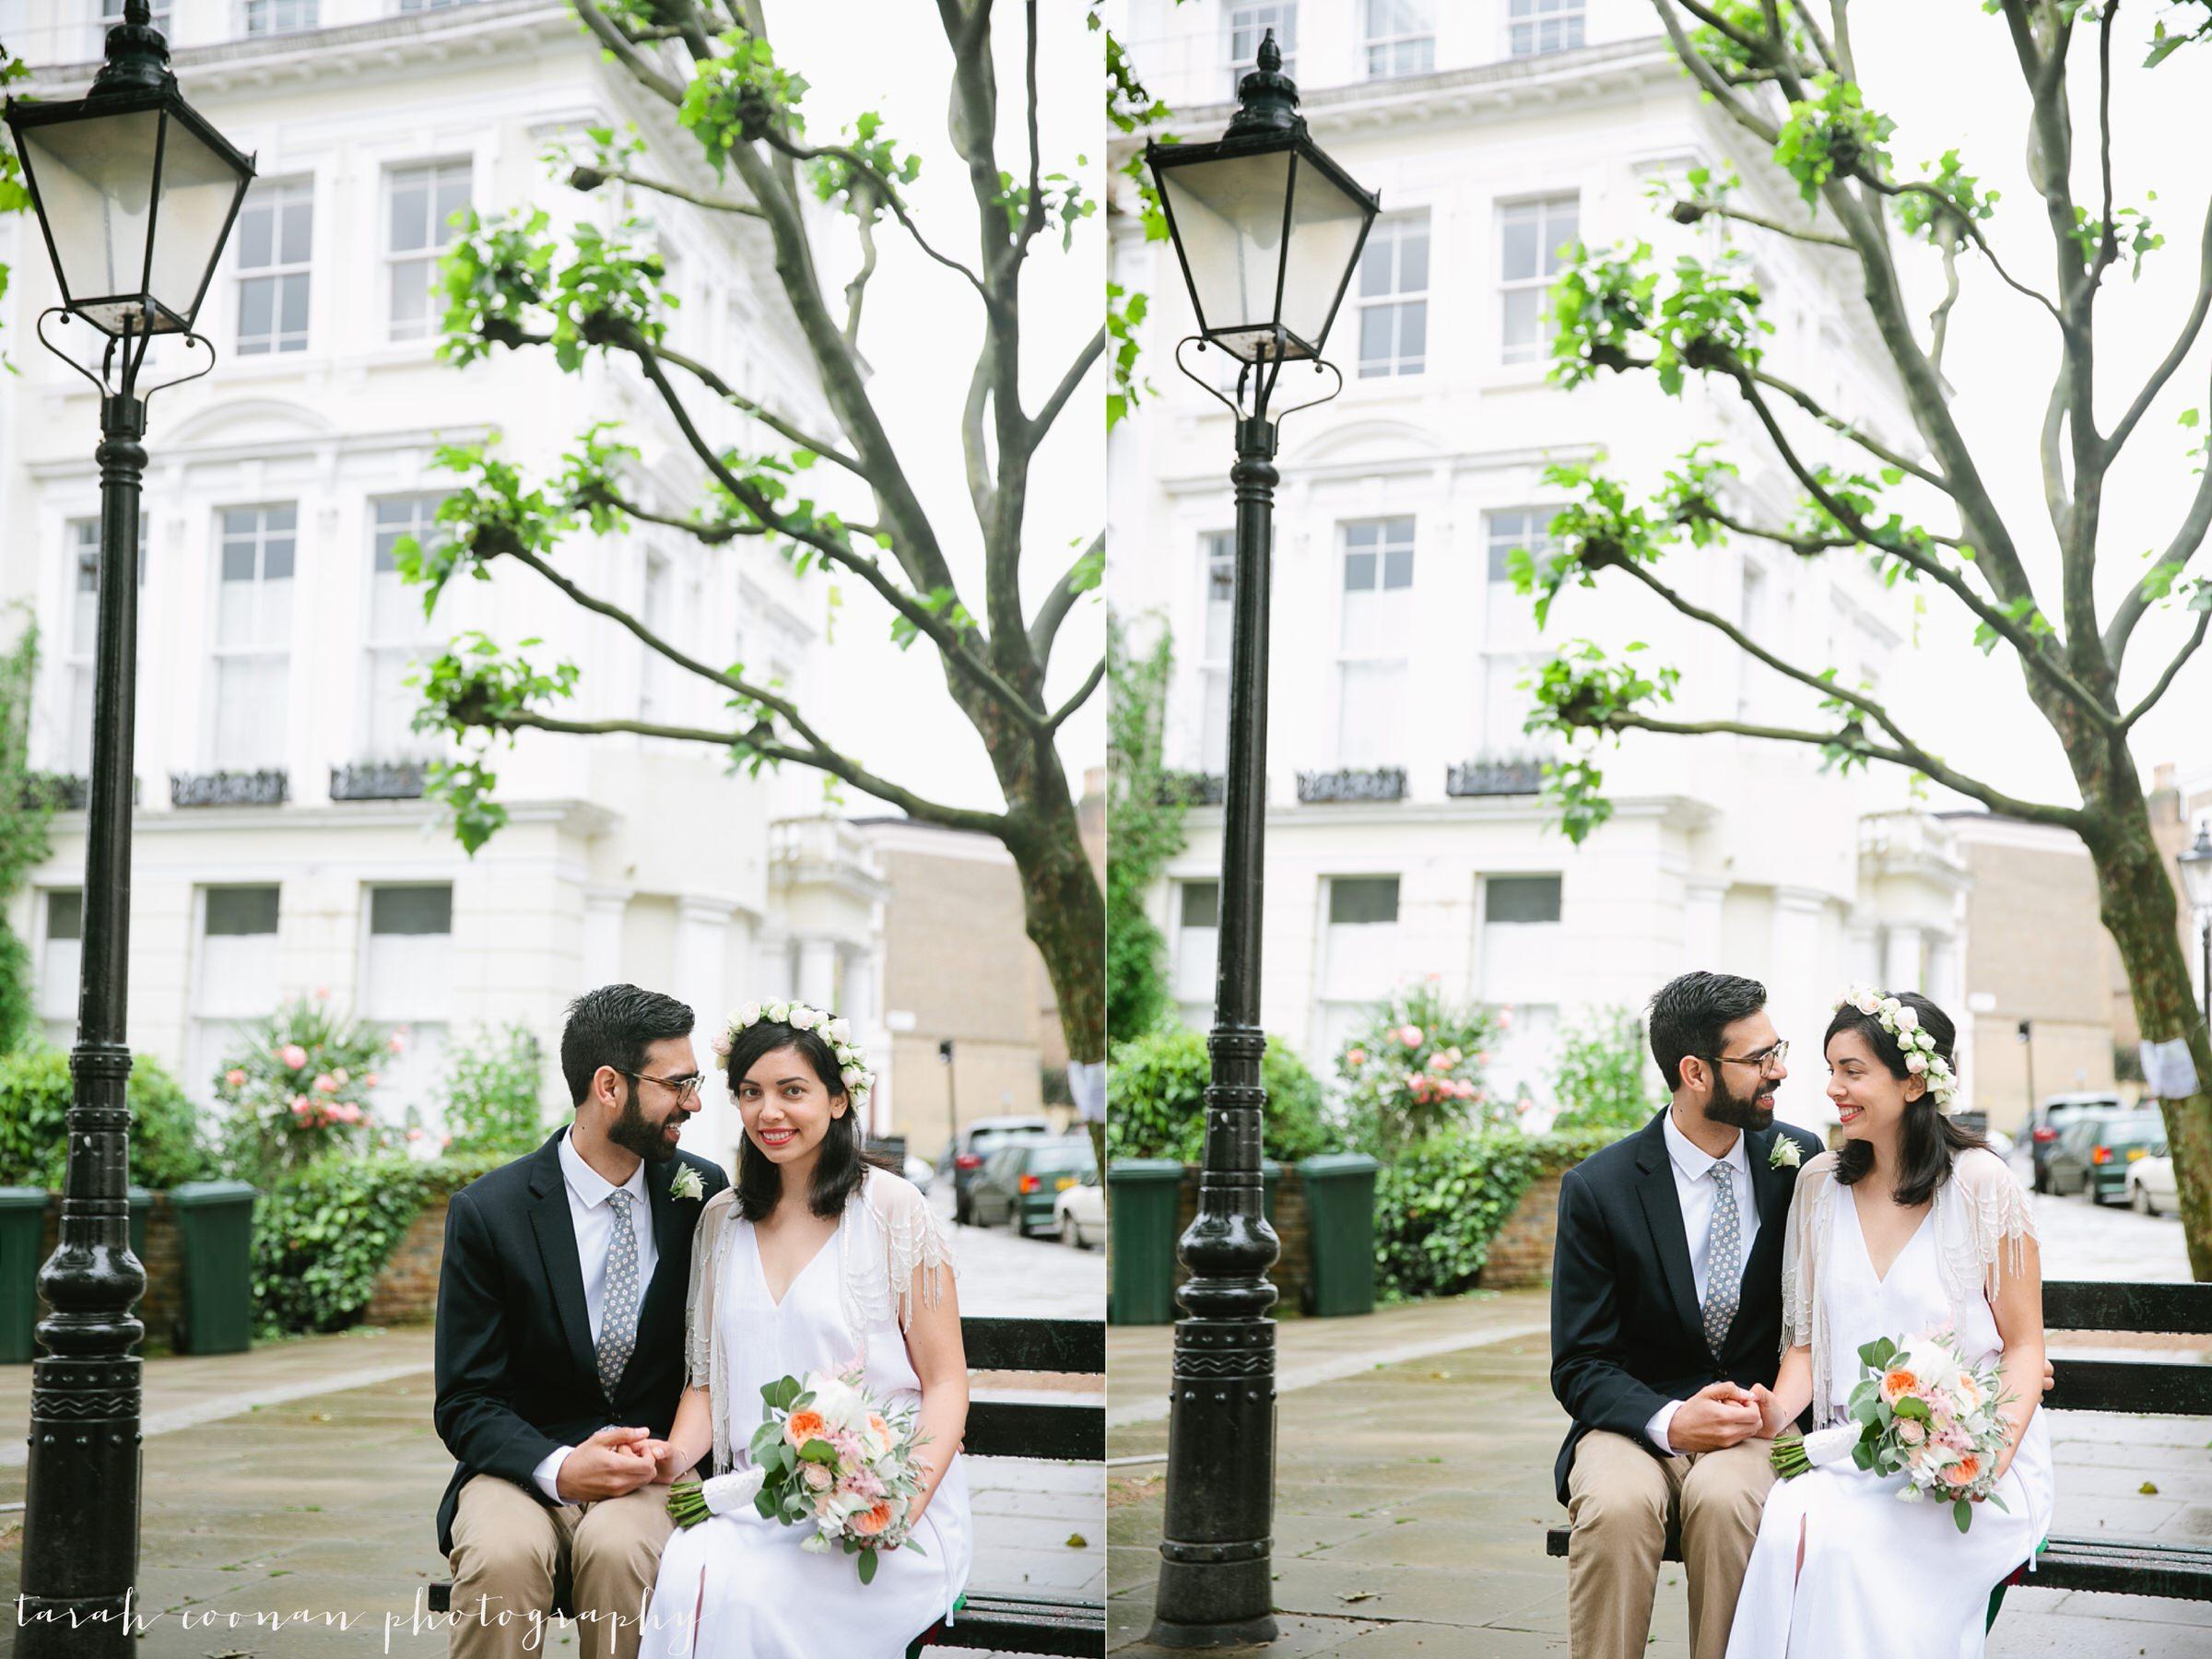 primrose hill wedding photographer